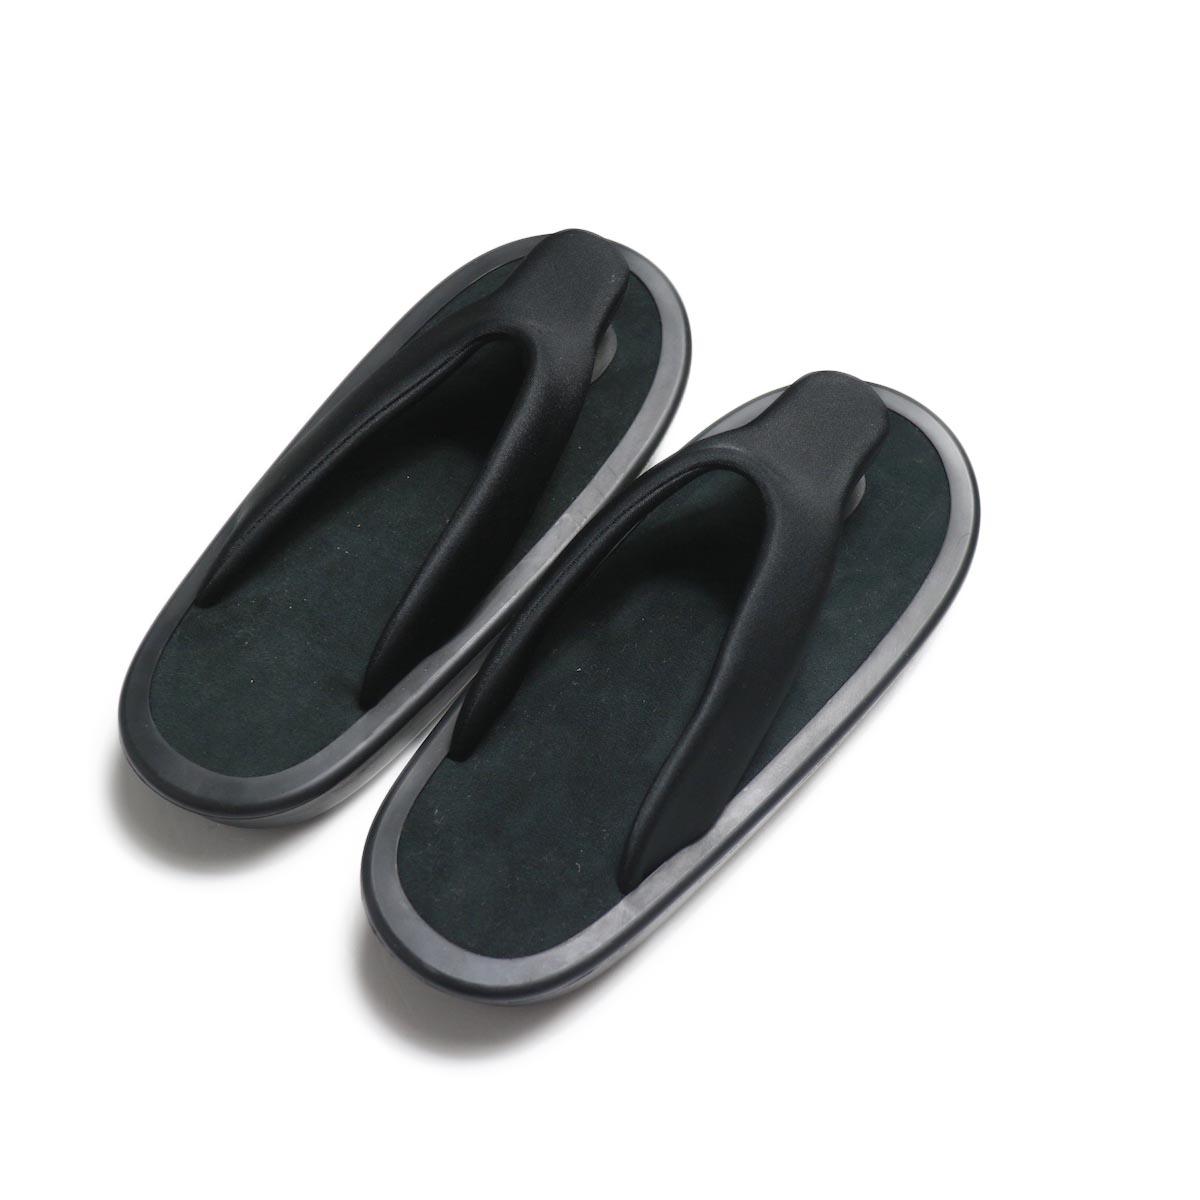 JOJO / Beach Sandal -Black (細鼻緒 / Navy Suede)背面